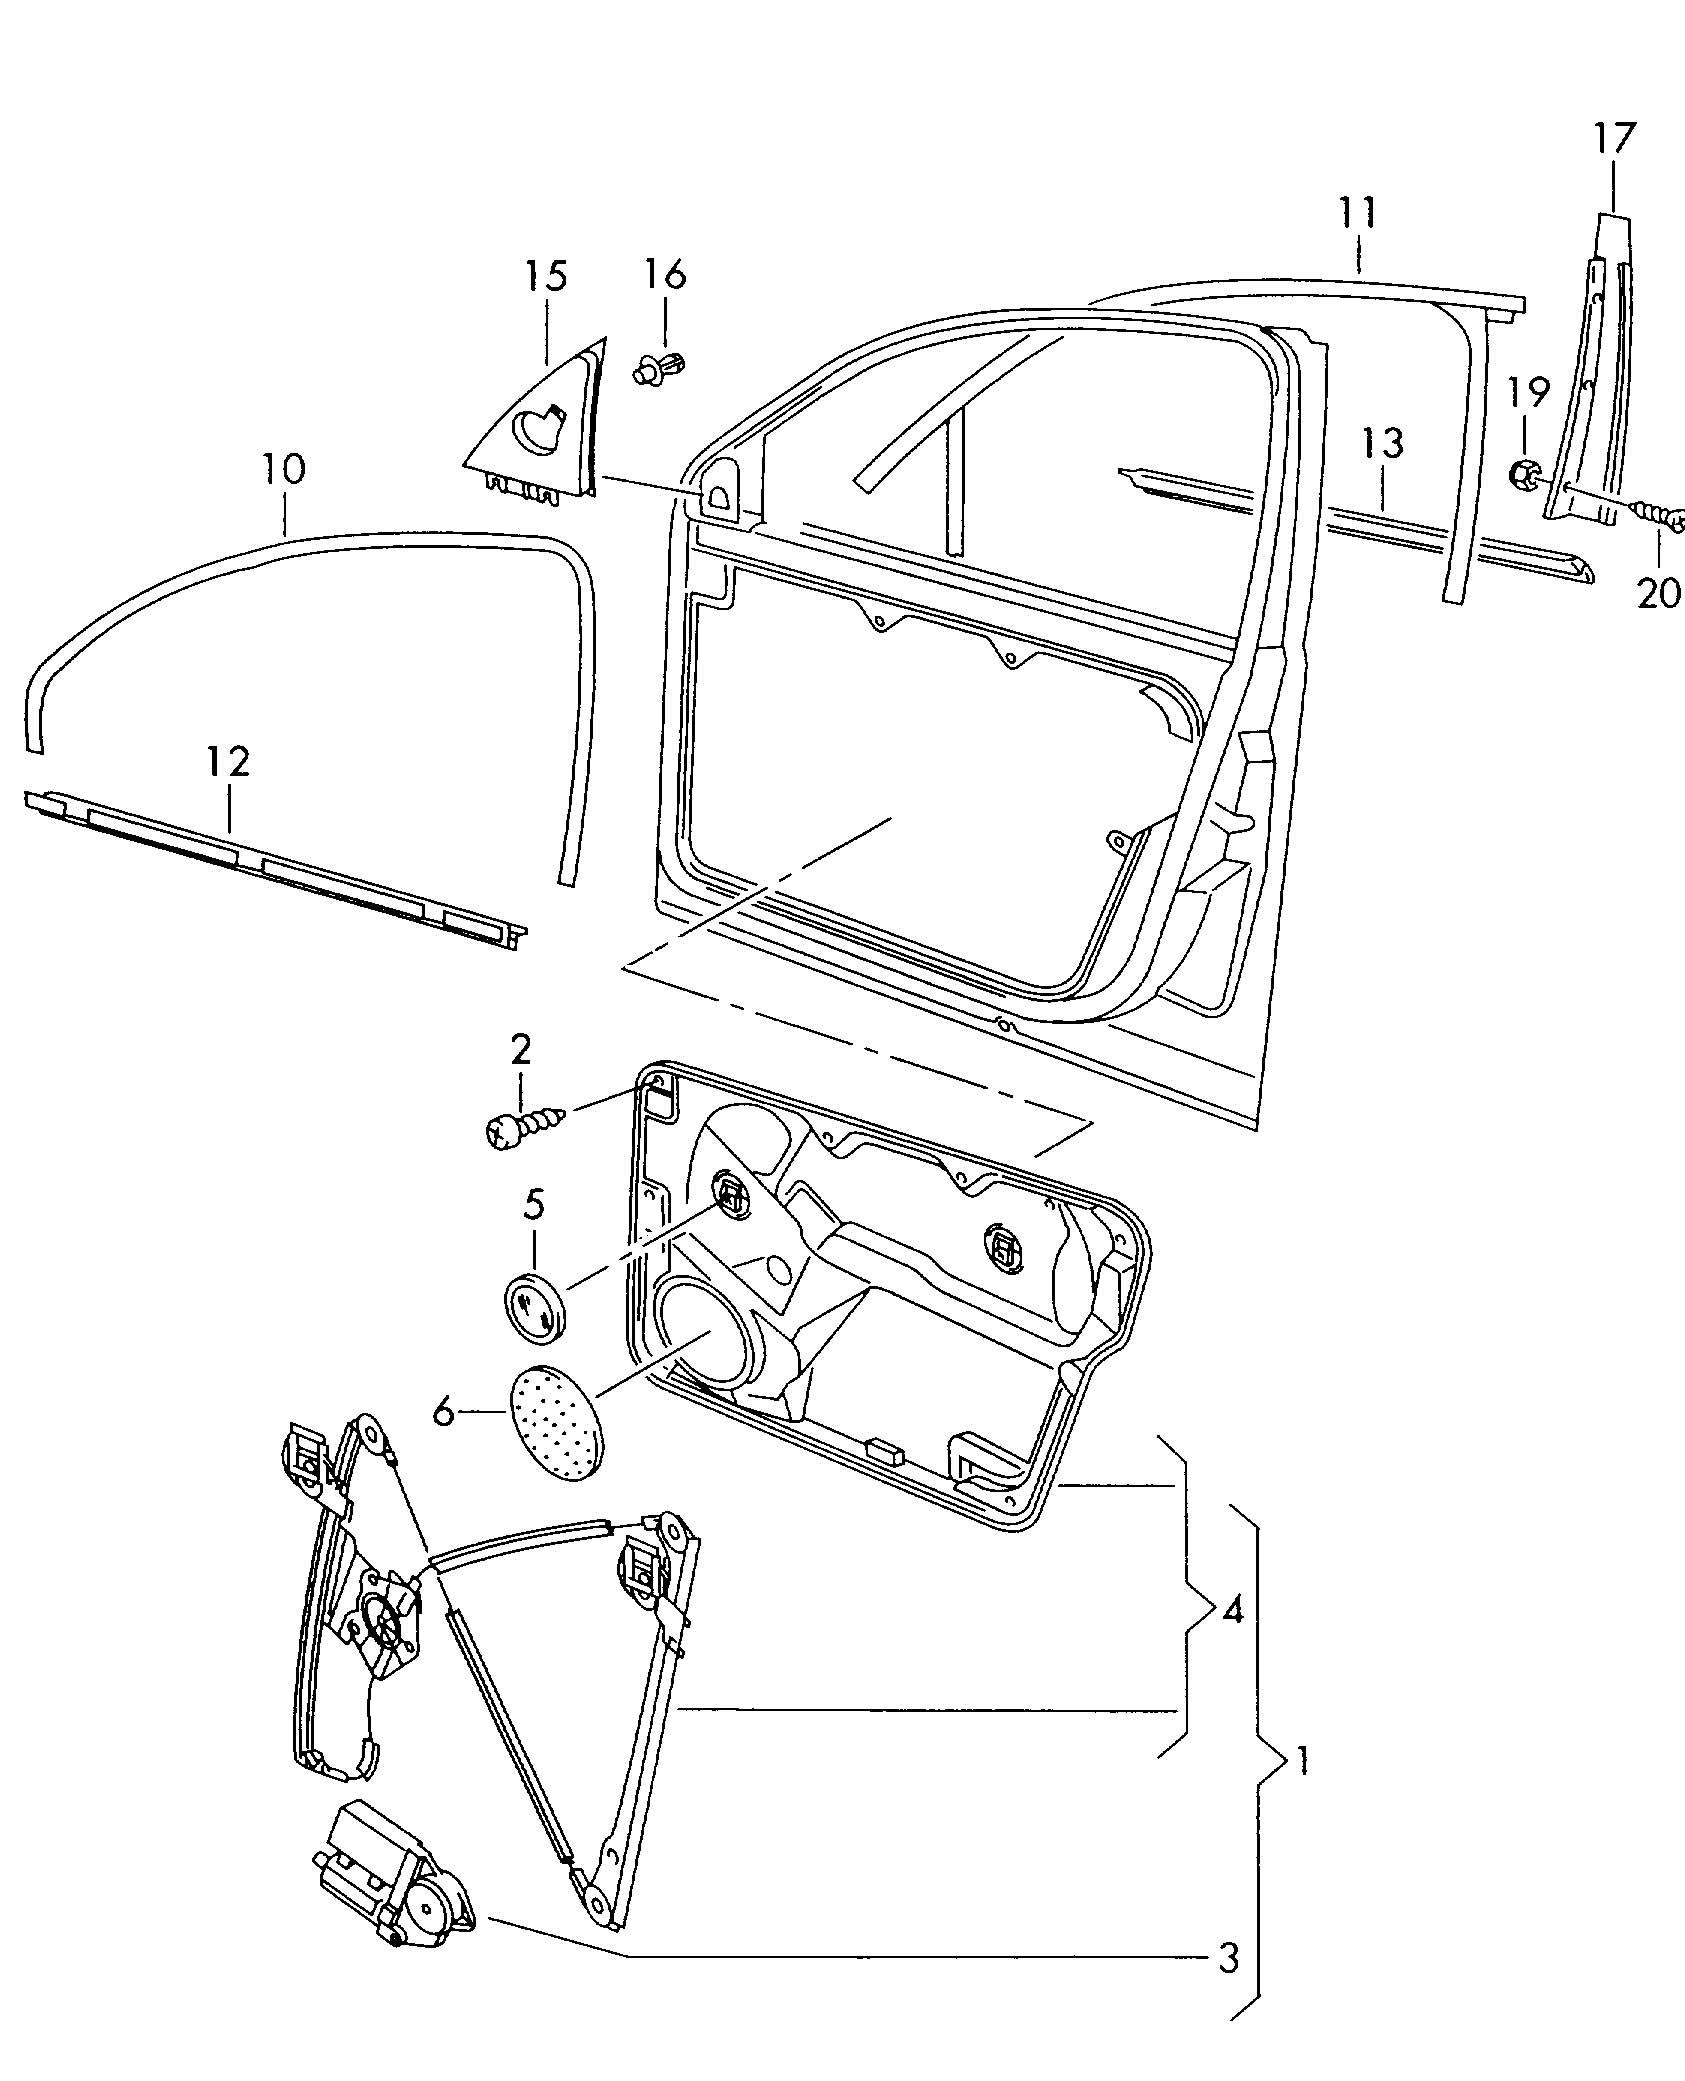 Glass channel window regulator window slot seal trim for for 1999 vw passat window regulator clips